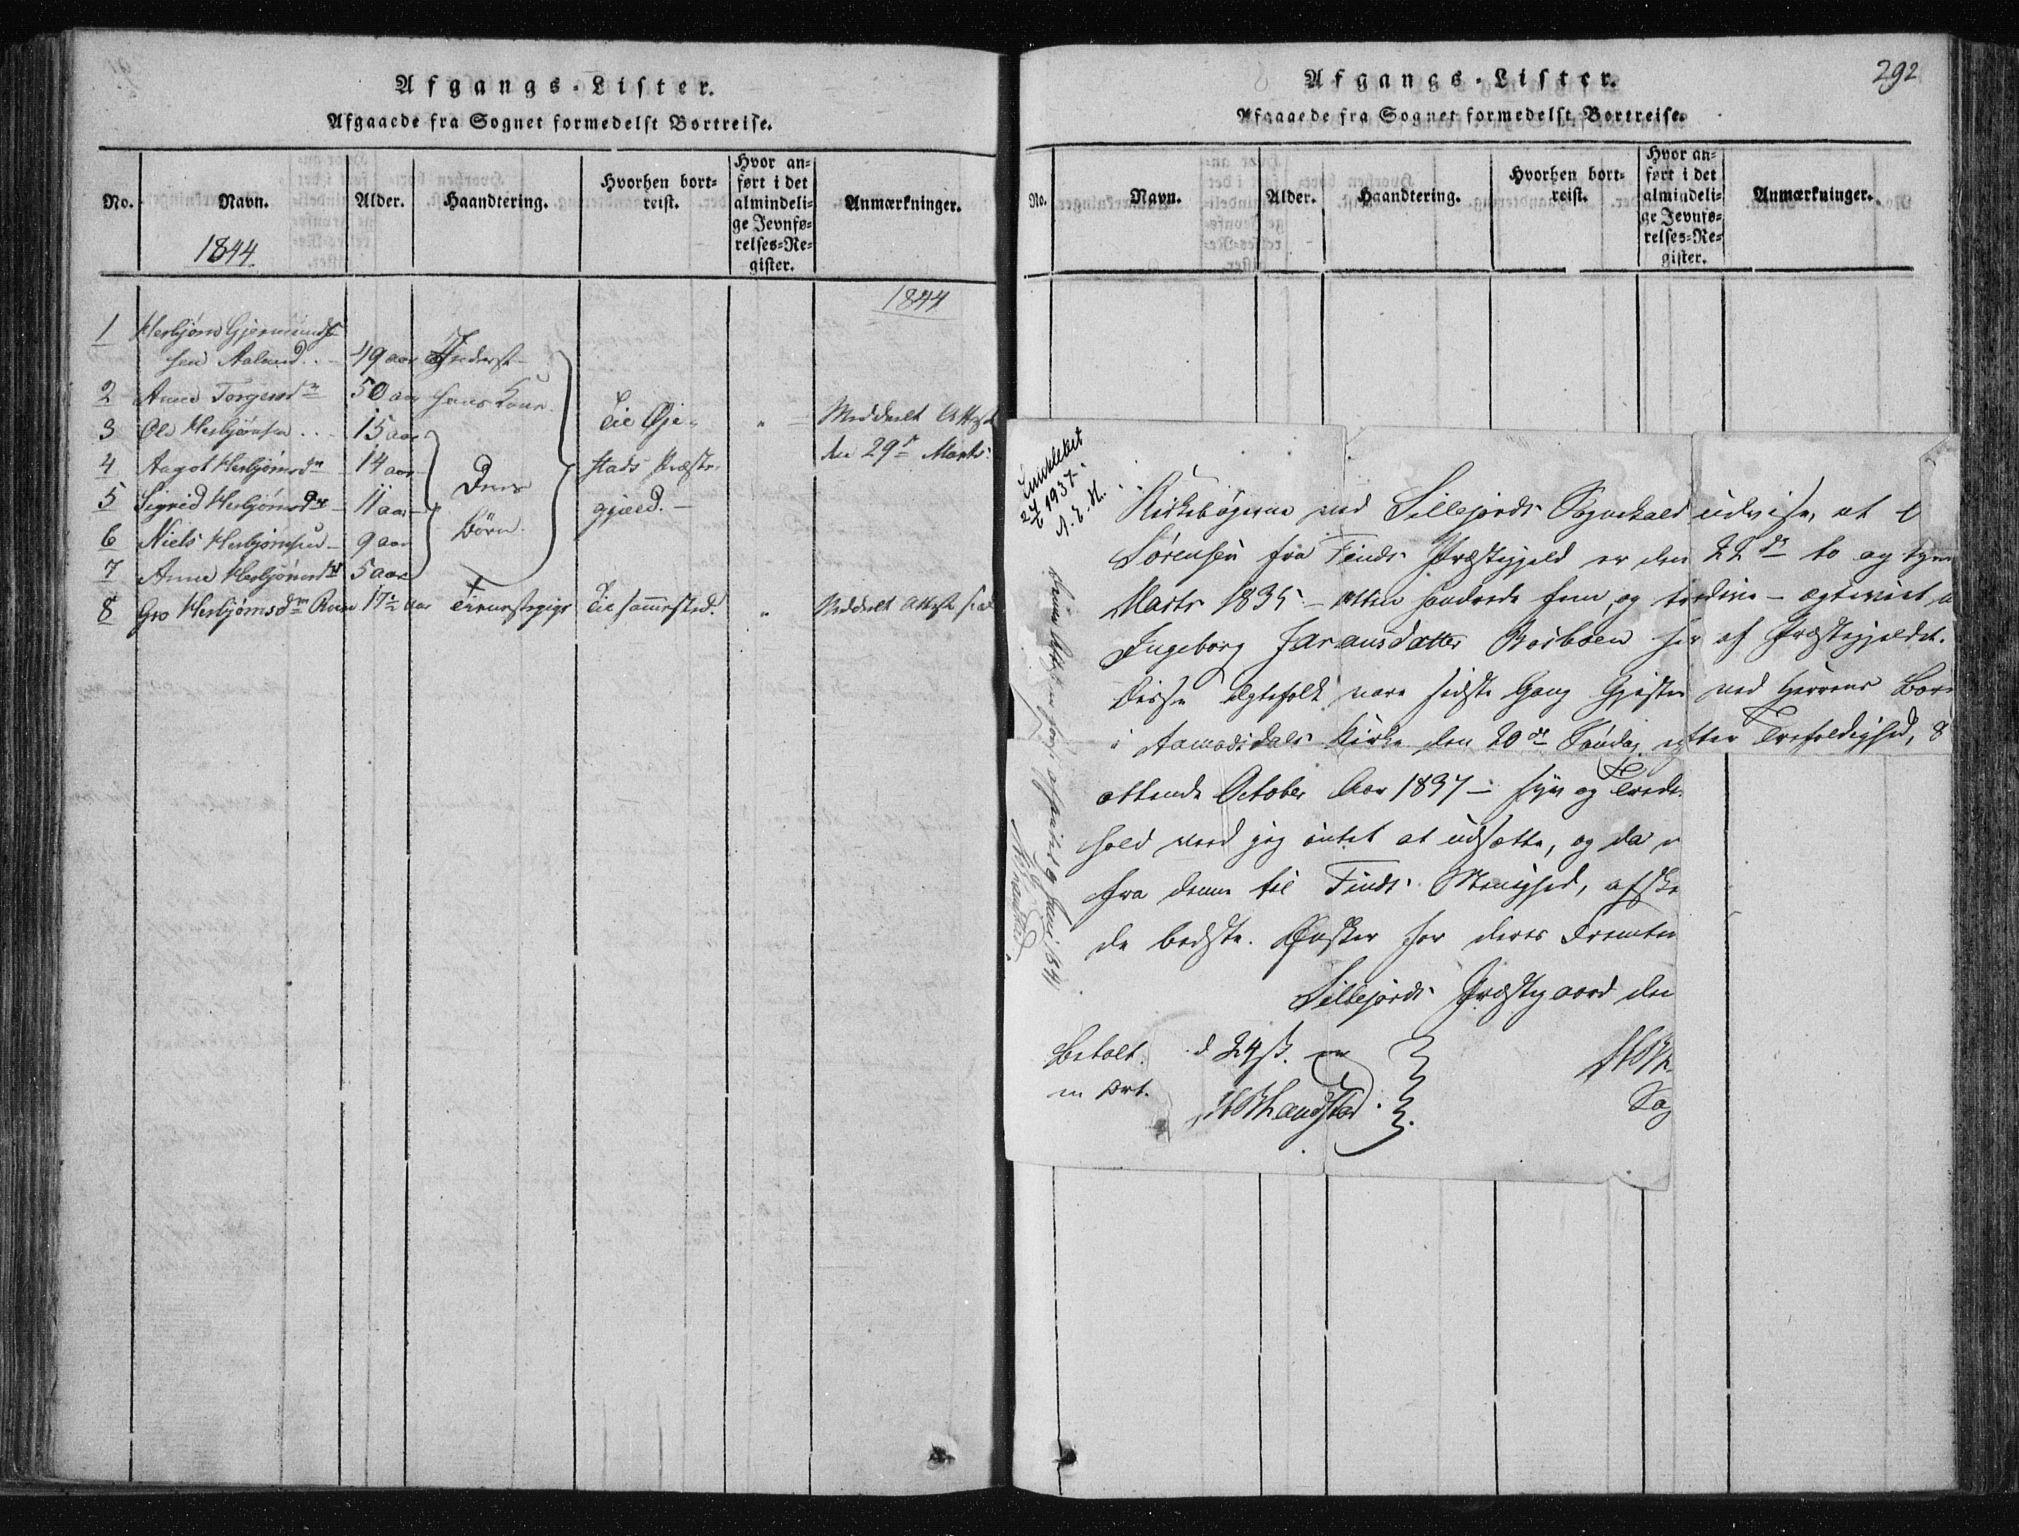 SAKO, Tinn kirkebøker, F/Fc/L0001: Ministerialbok nr. III 1, 1815-1843, s. 292